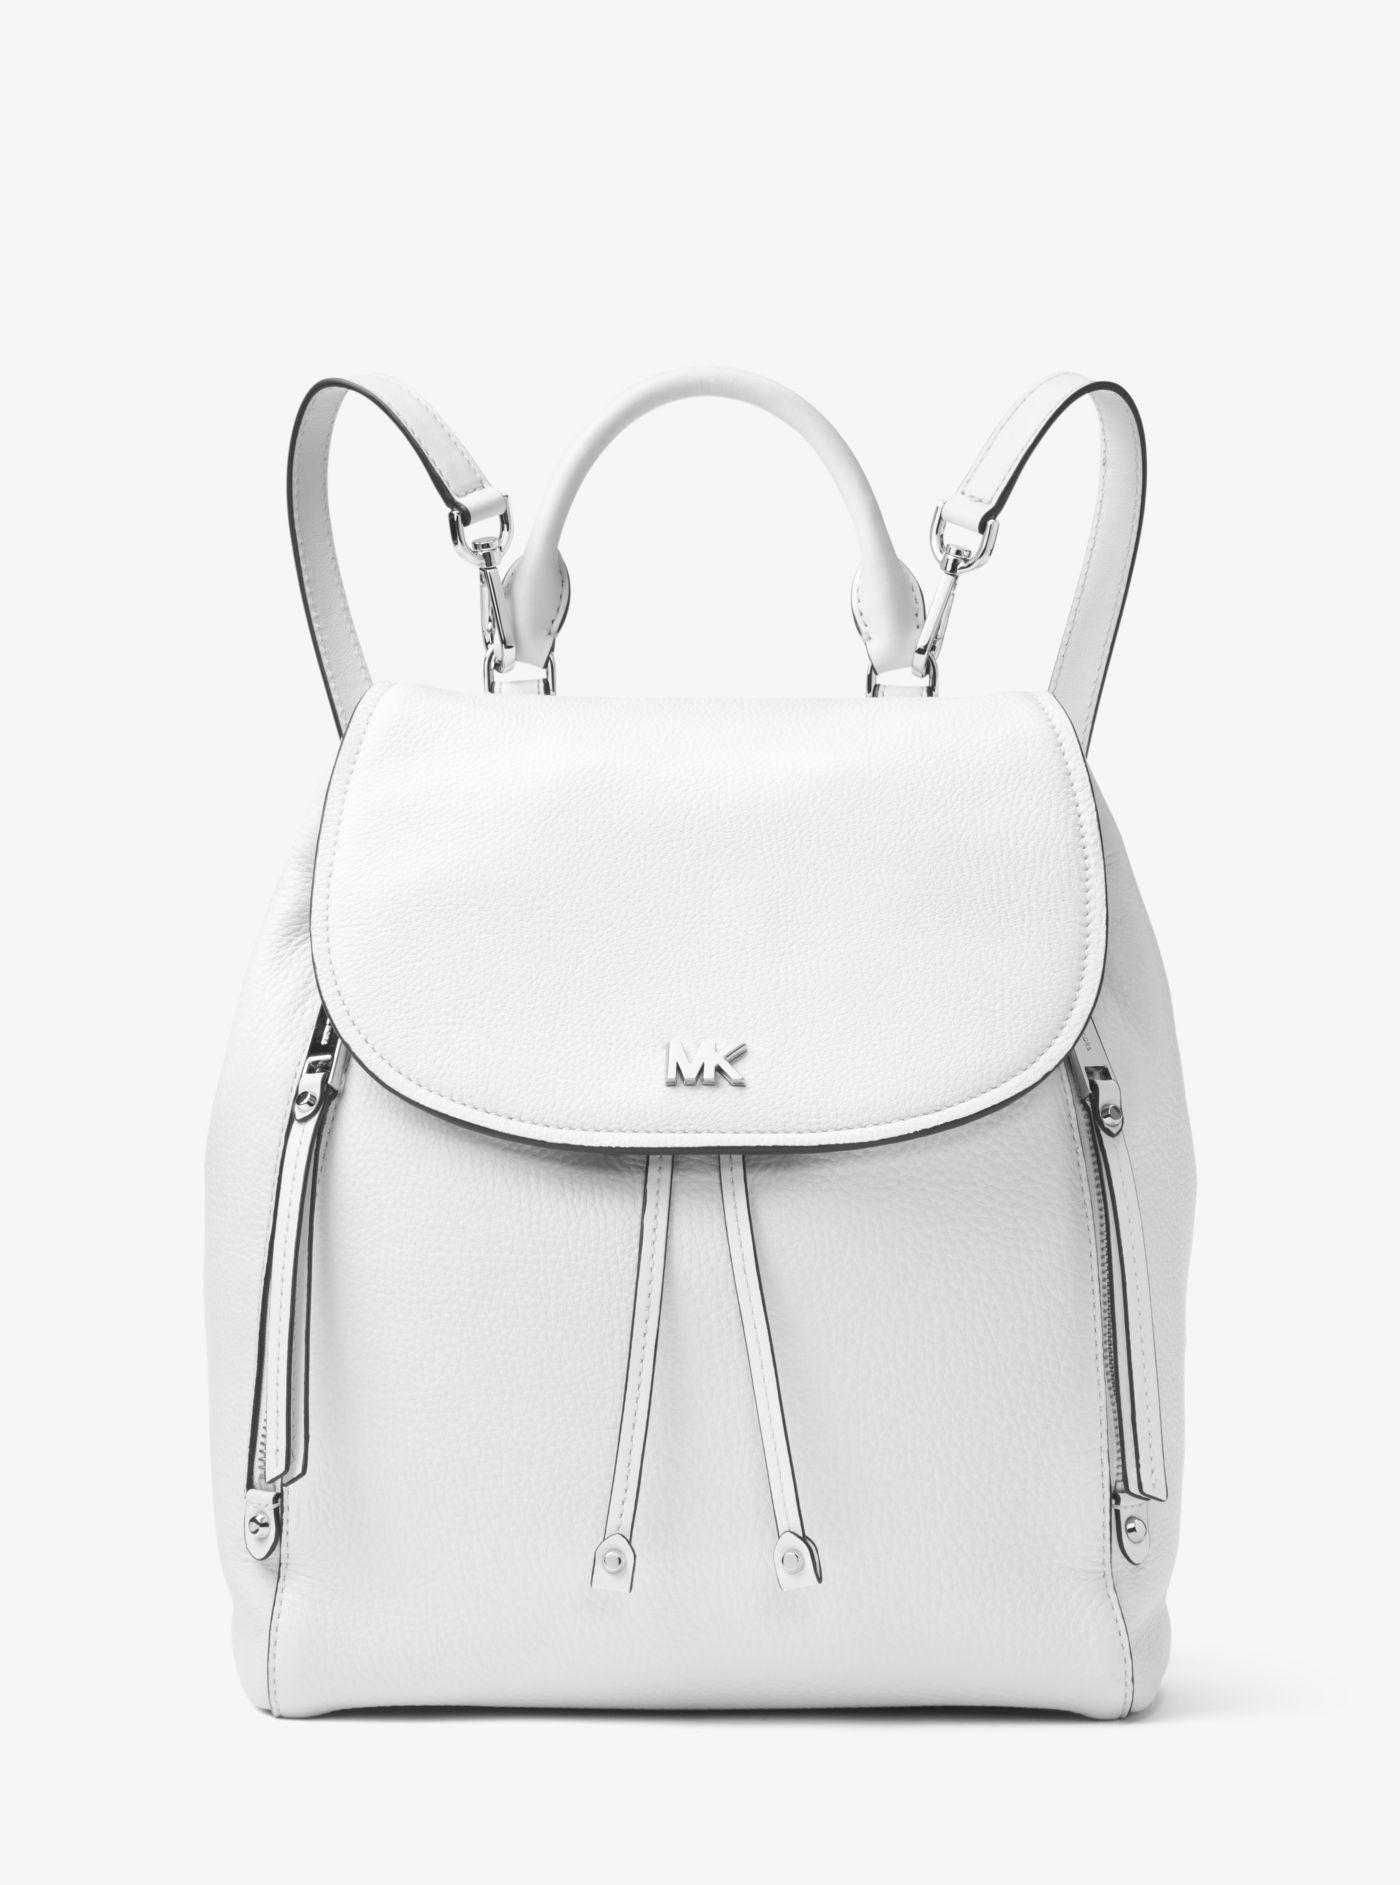 9e06f7d63 Michael Kors Evie Medium Leather Backpack in White - Lyst